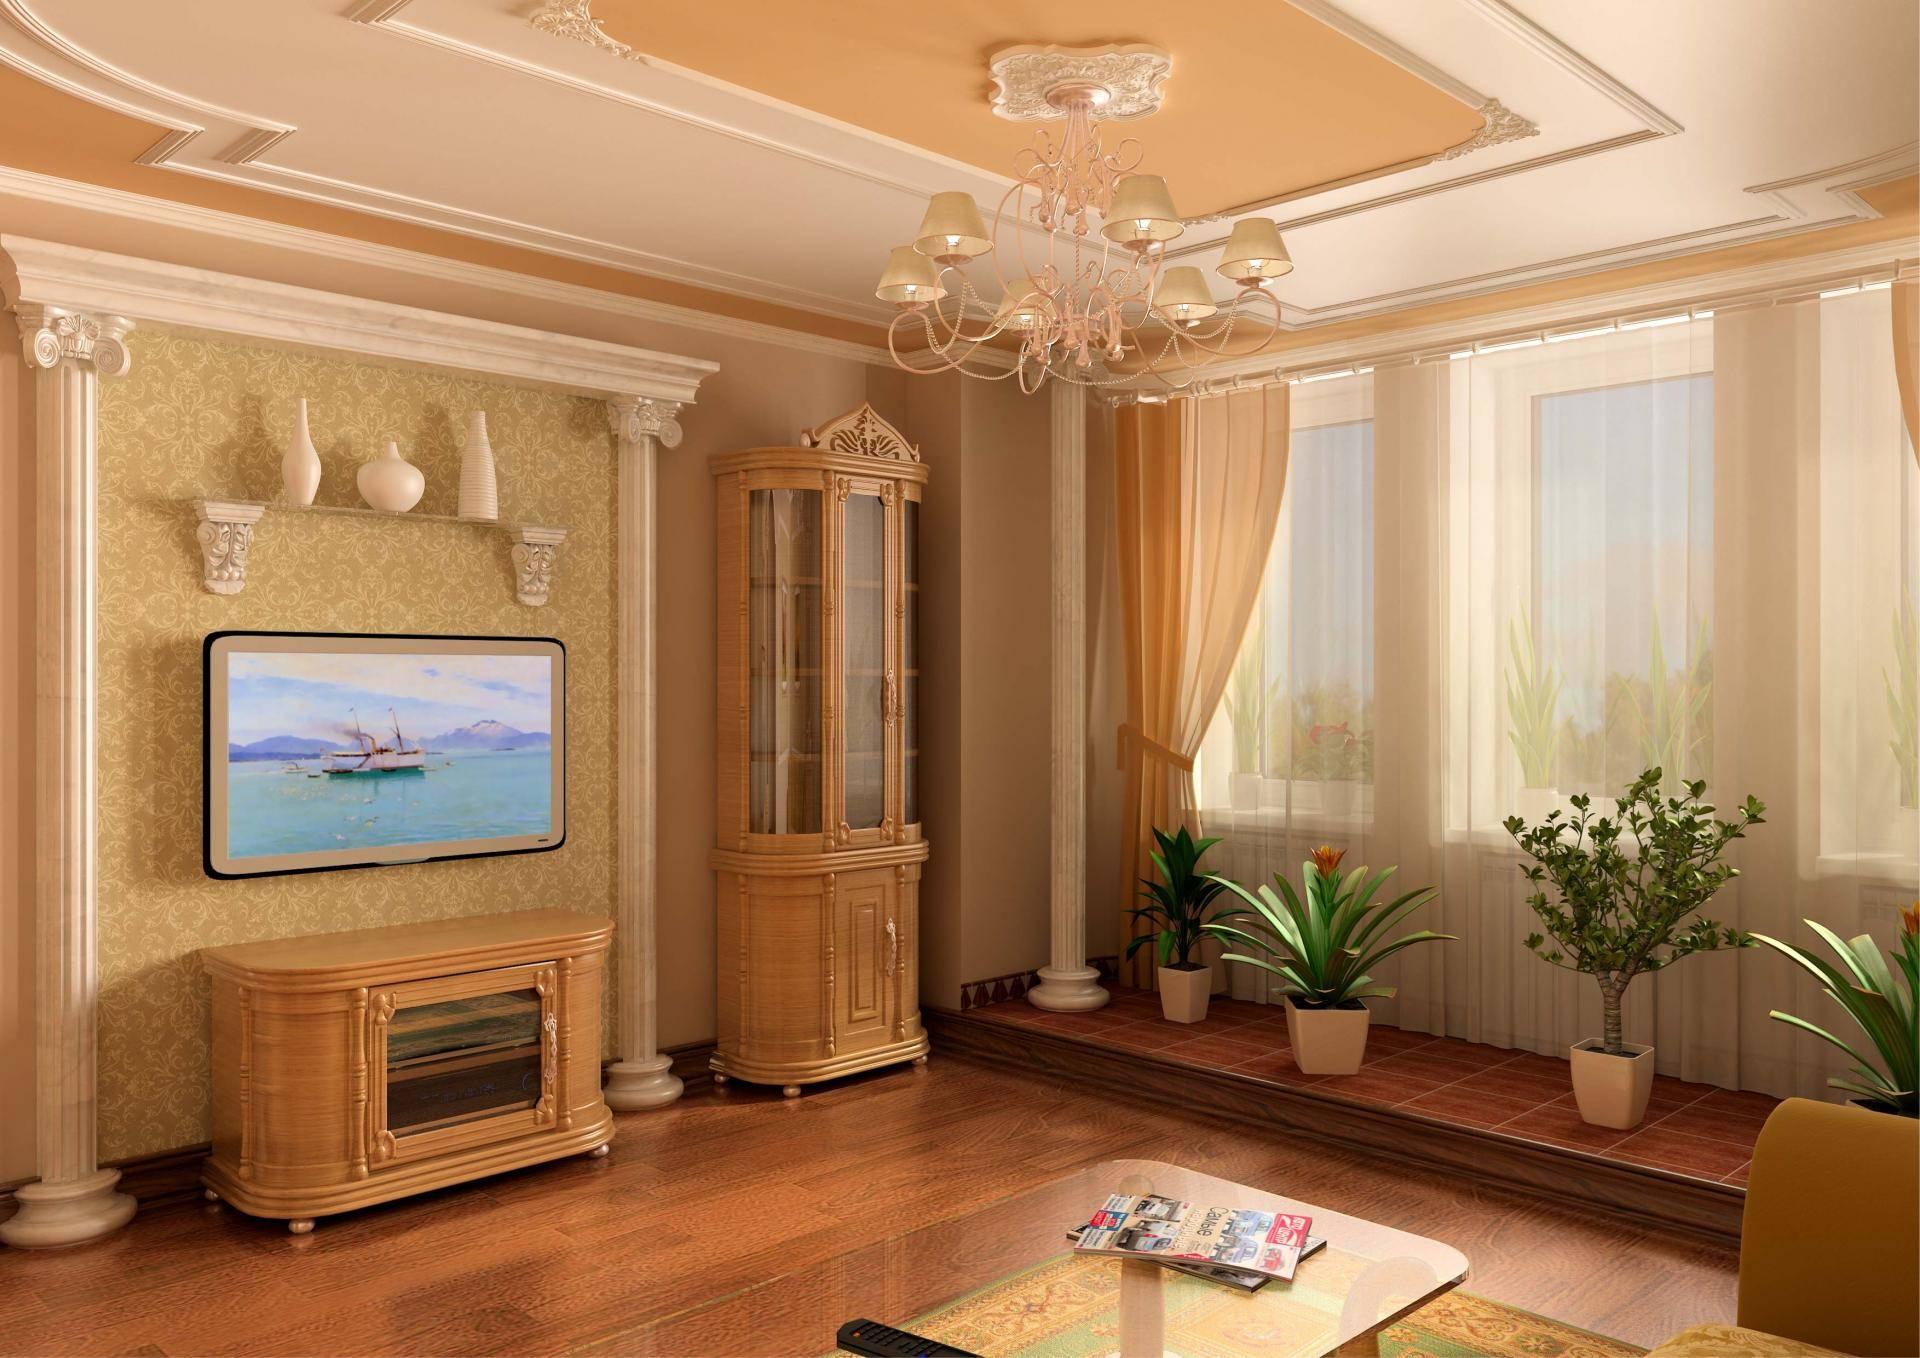 Молдинги в интерьере квартиры - декоративные идеи дизайна